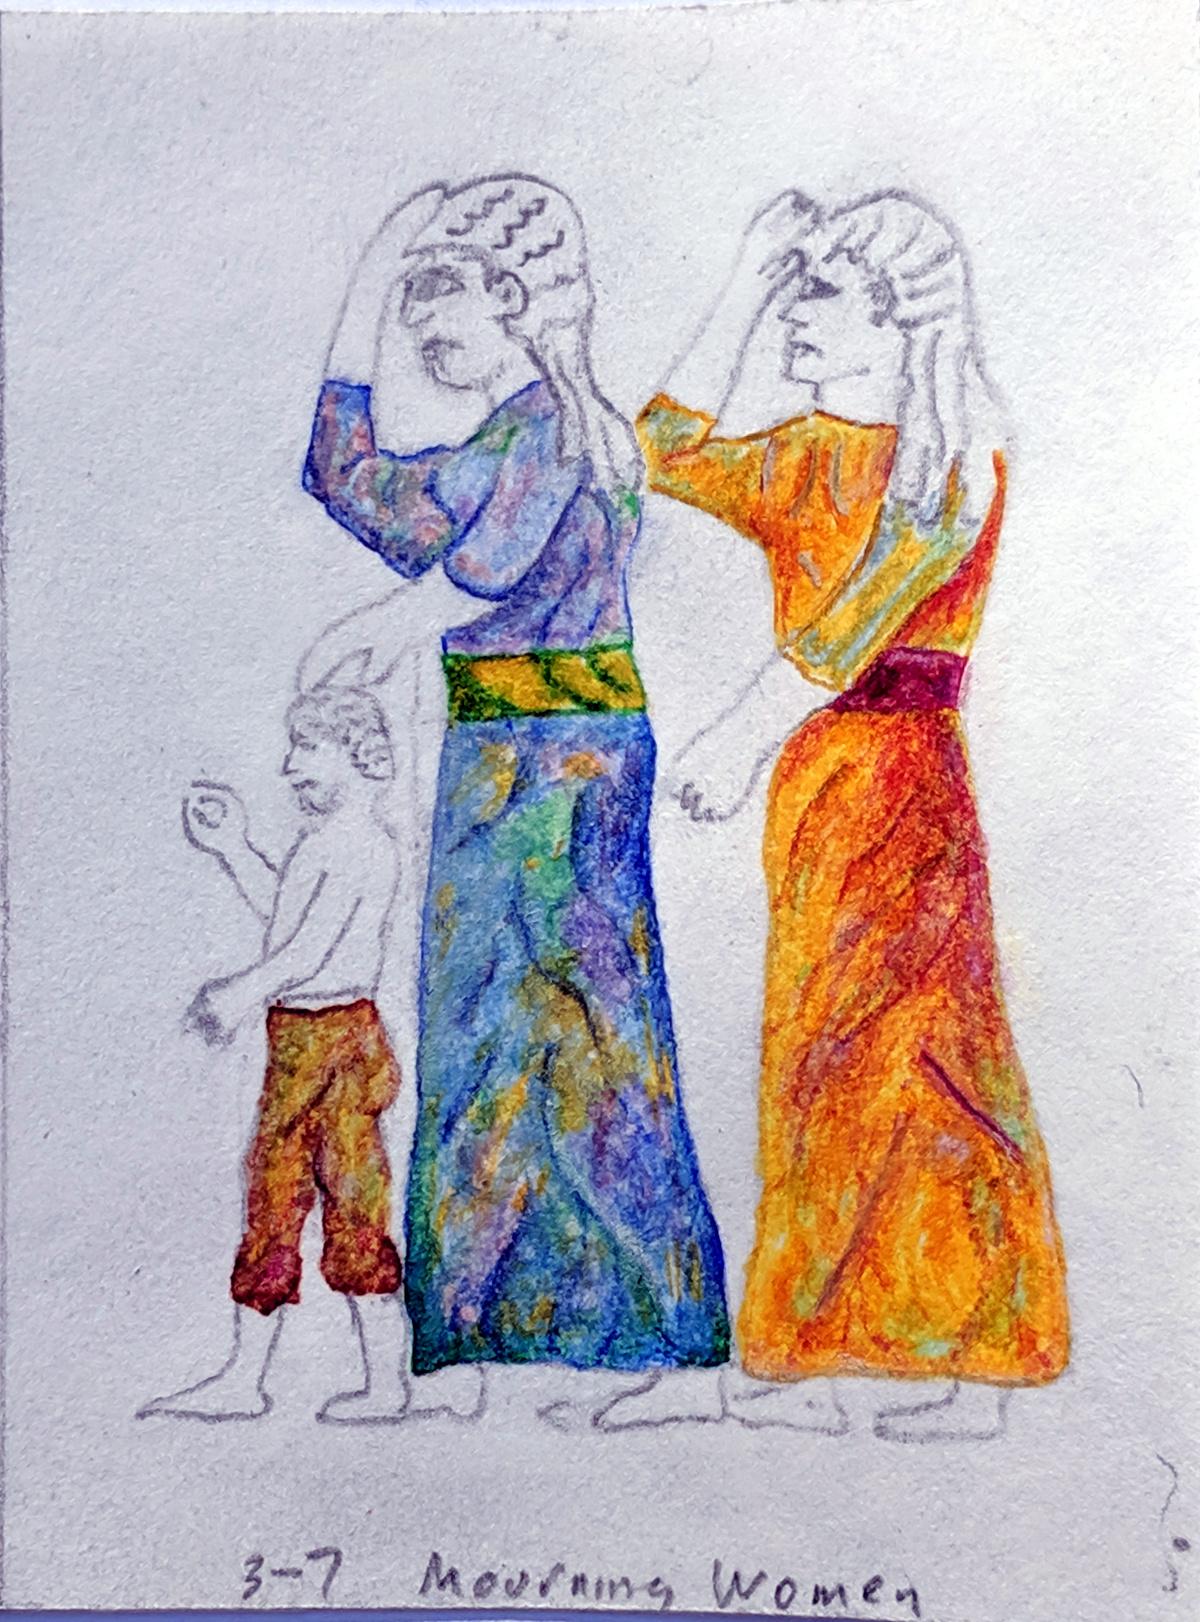 Image-37-1b-Colorwork1.jpg